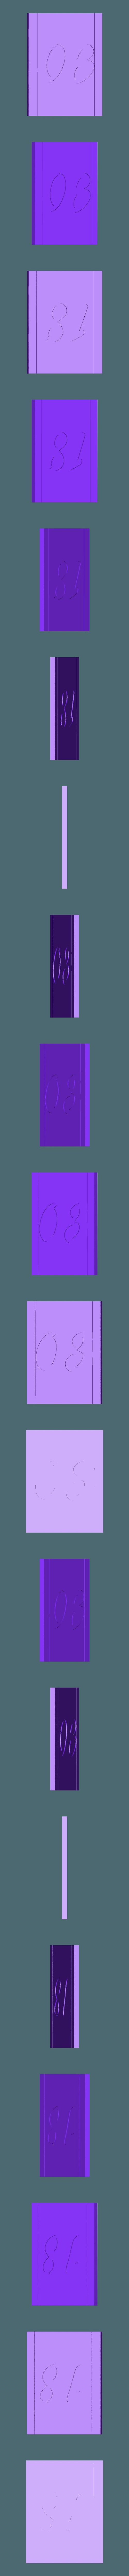 3_-_18.stl Download free SCAD file Perpetual Flip Calendar (W/ Customizable Font) • 3D printable model, Dsk